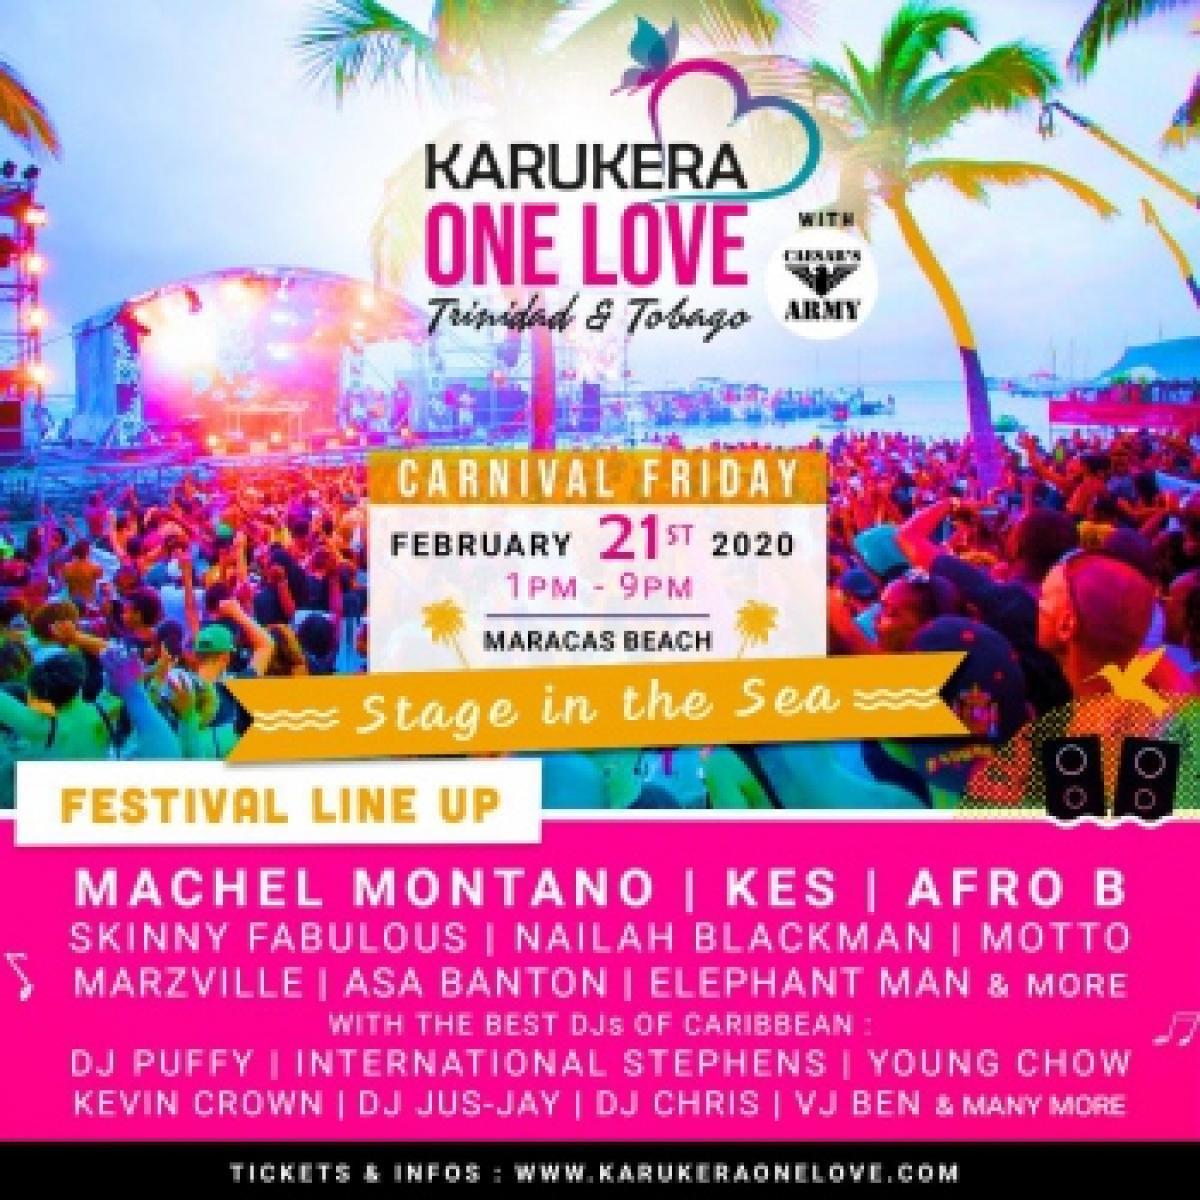 Karukera One Love Festival flyer or graphic.